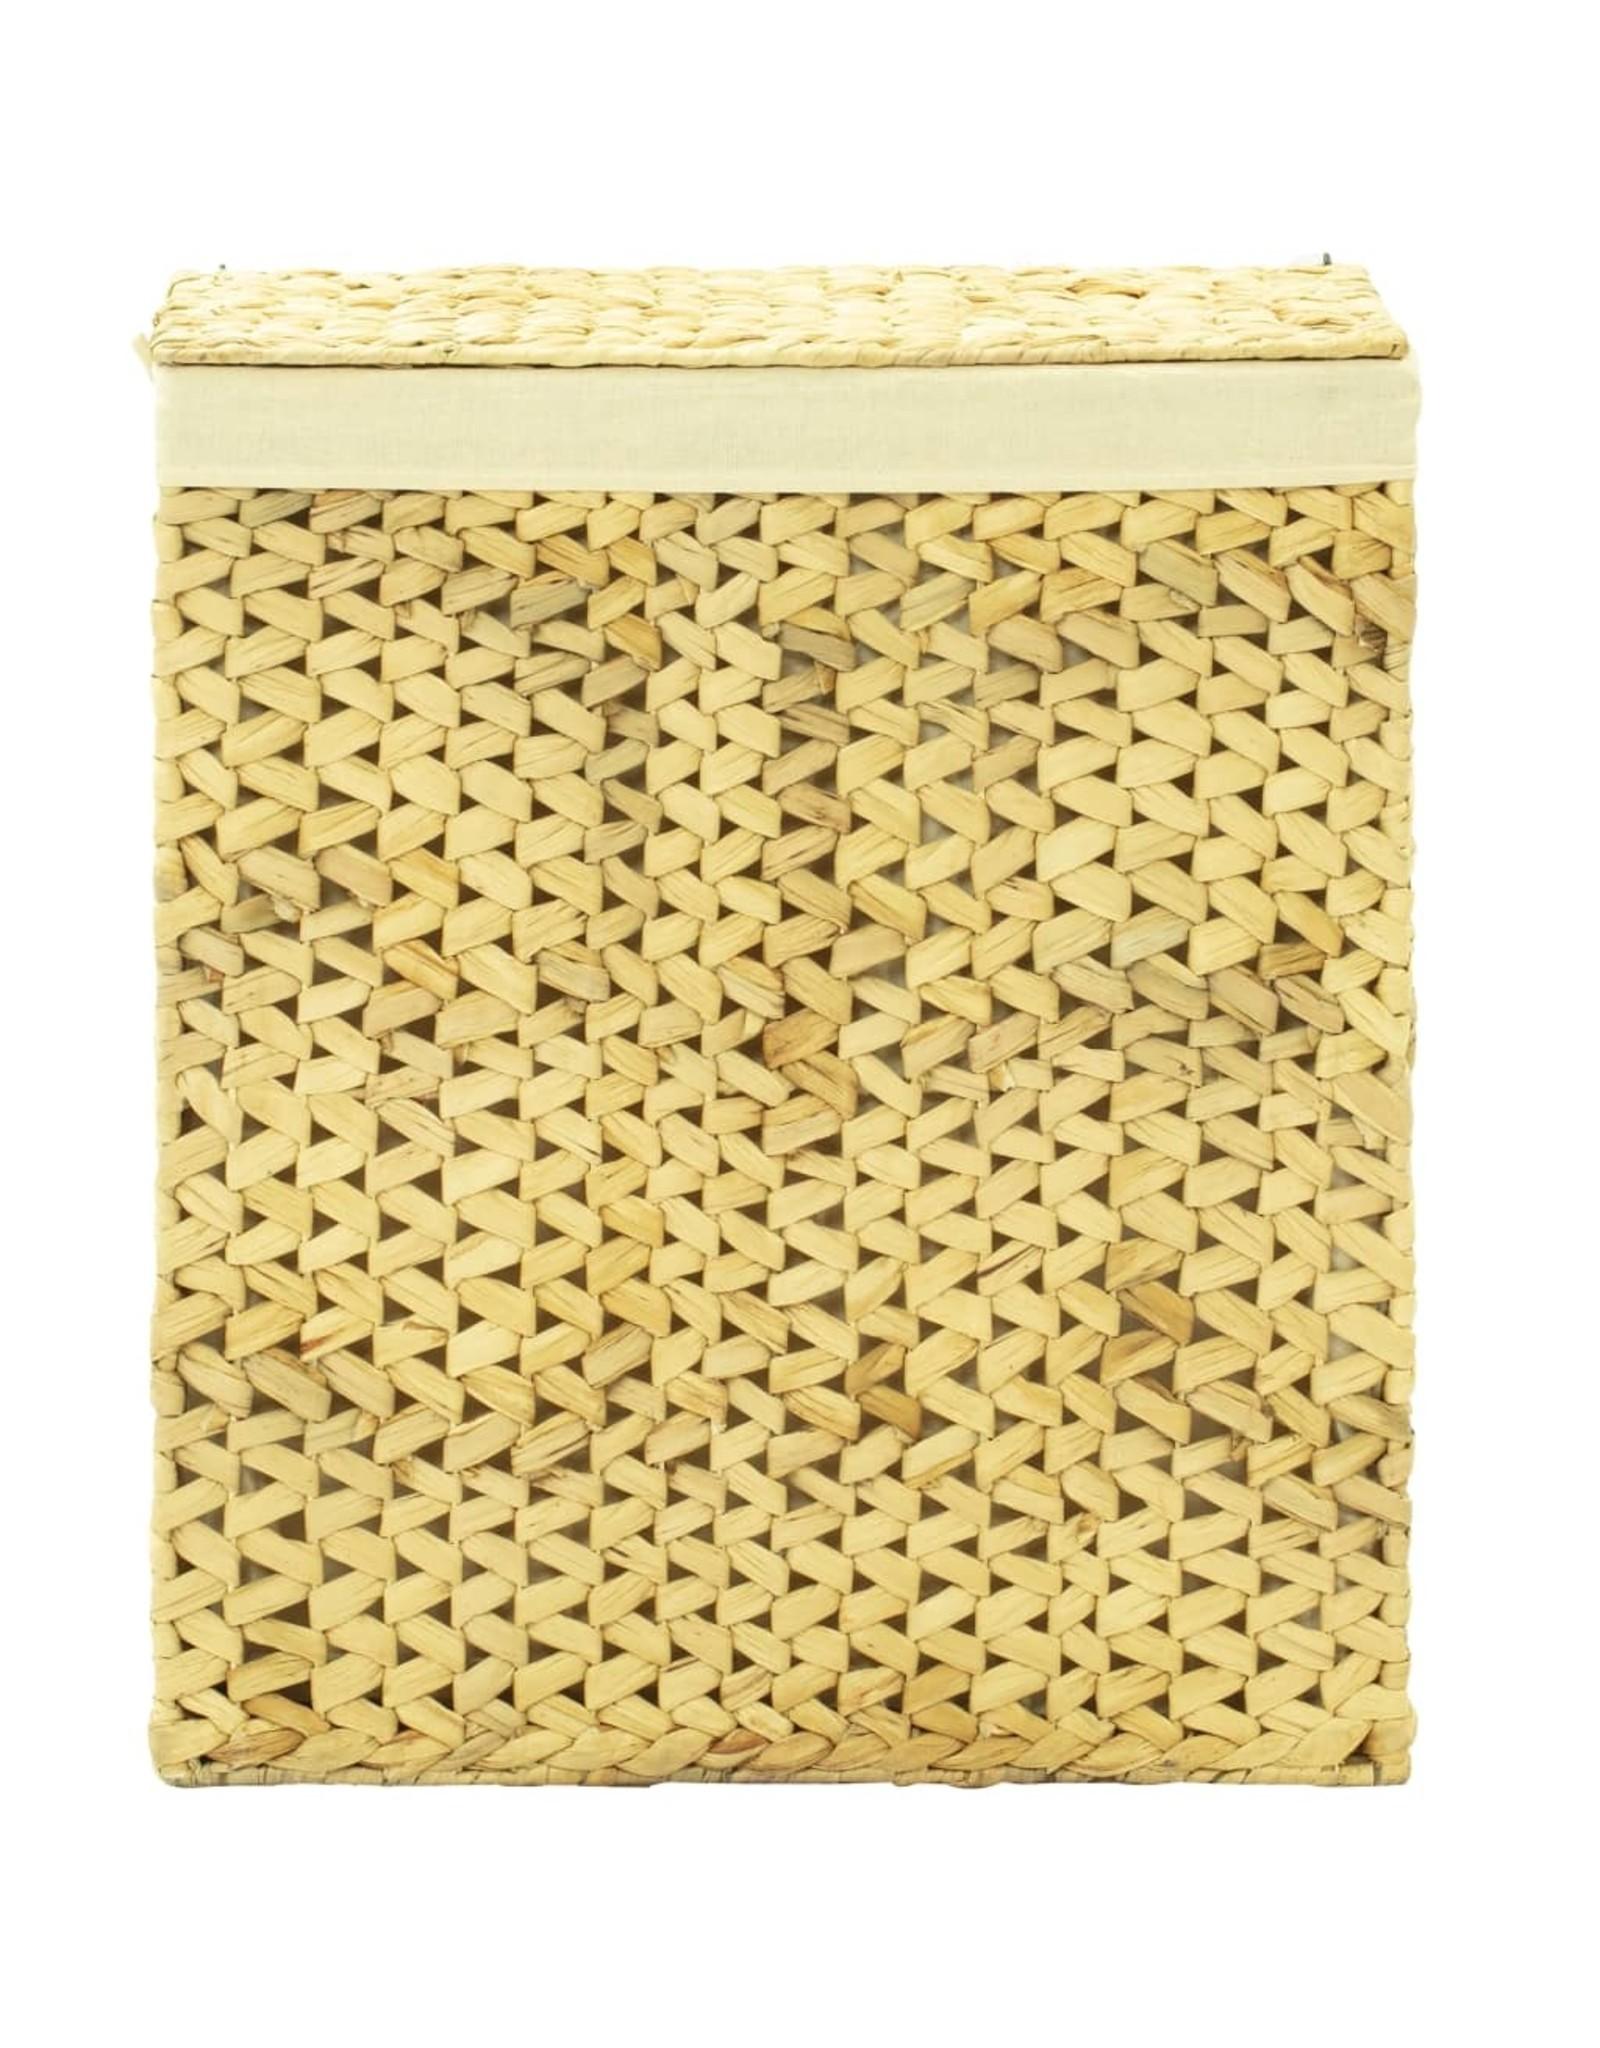 4-delige Badkamerset waterhyacint